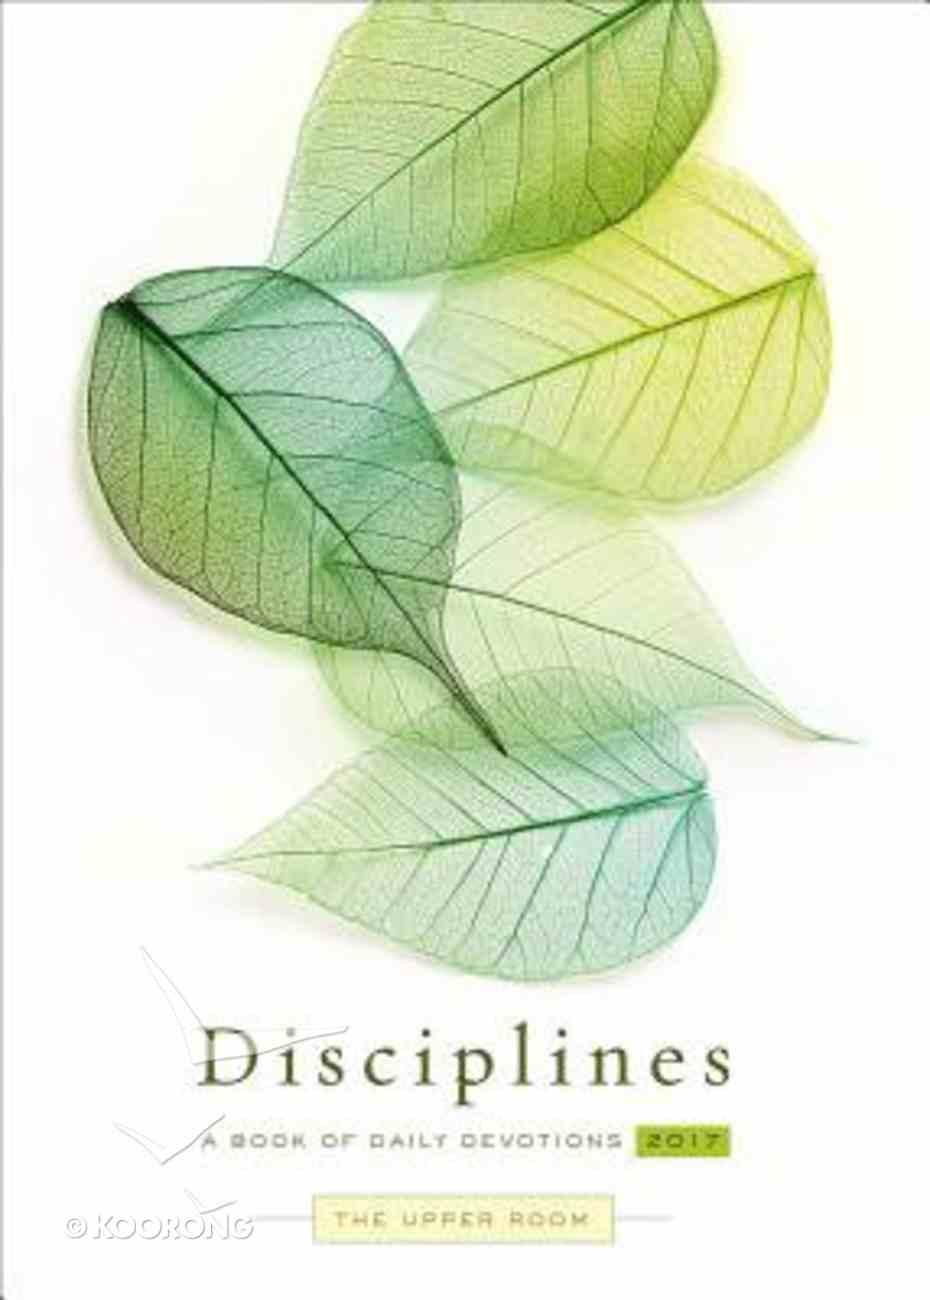 The Upper Room Disciplines 2017 Paperback